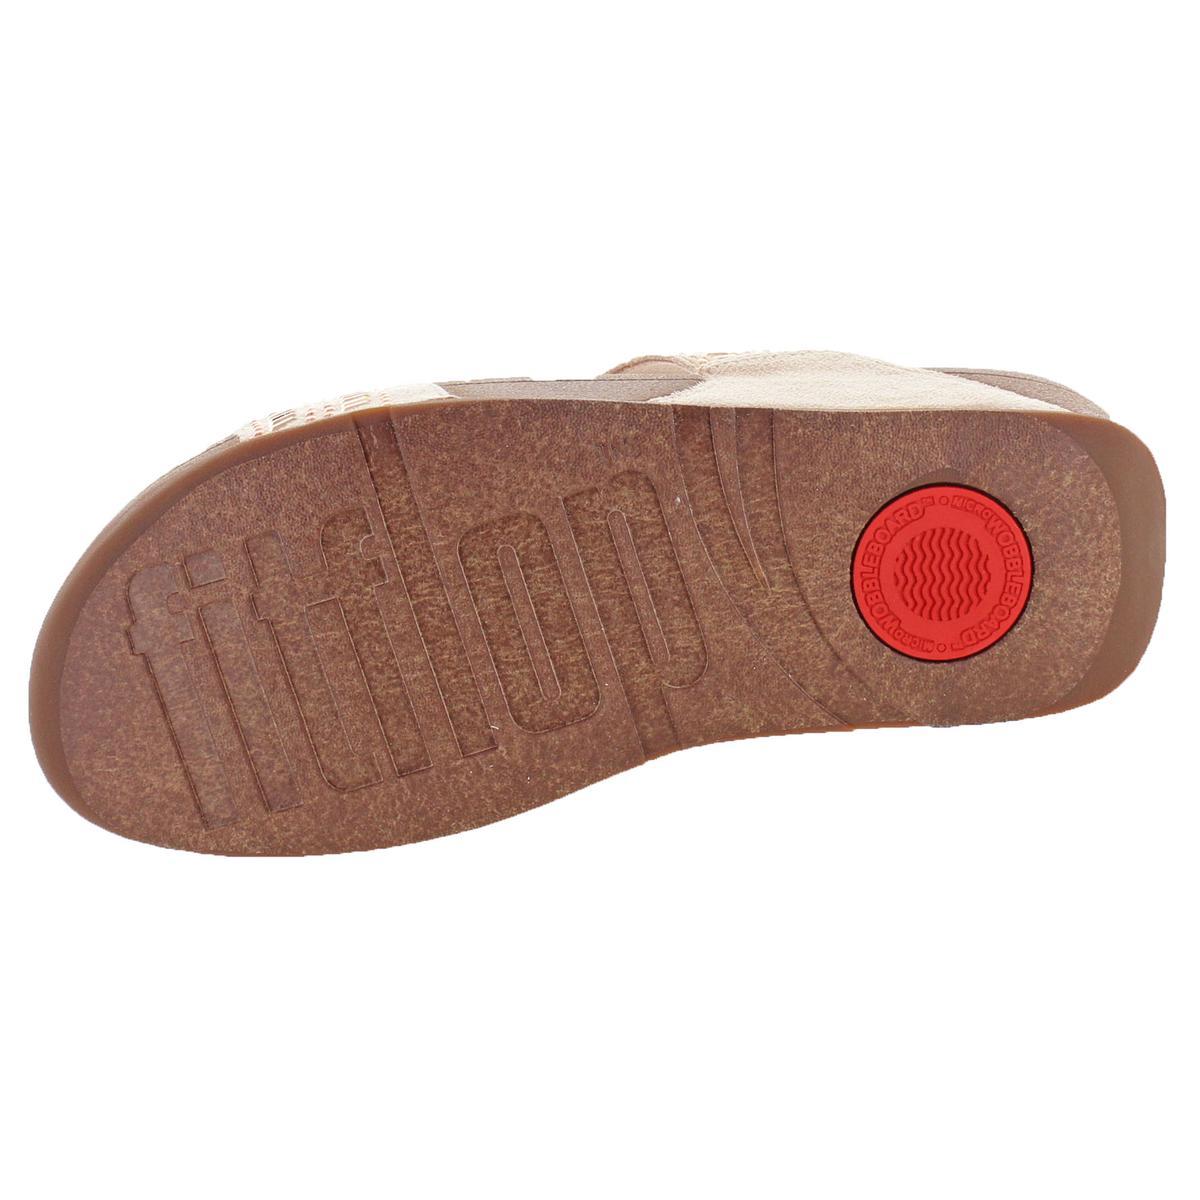 83f98ba28 FitFlop Womens Incastone Pink Slide Sandals Shoes 8 Medium (b M ...